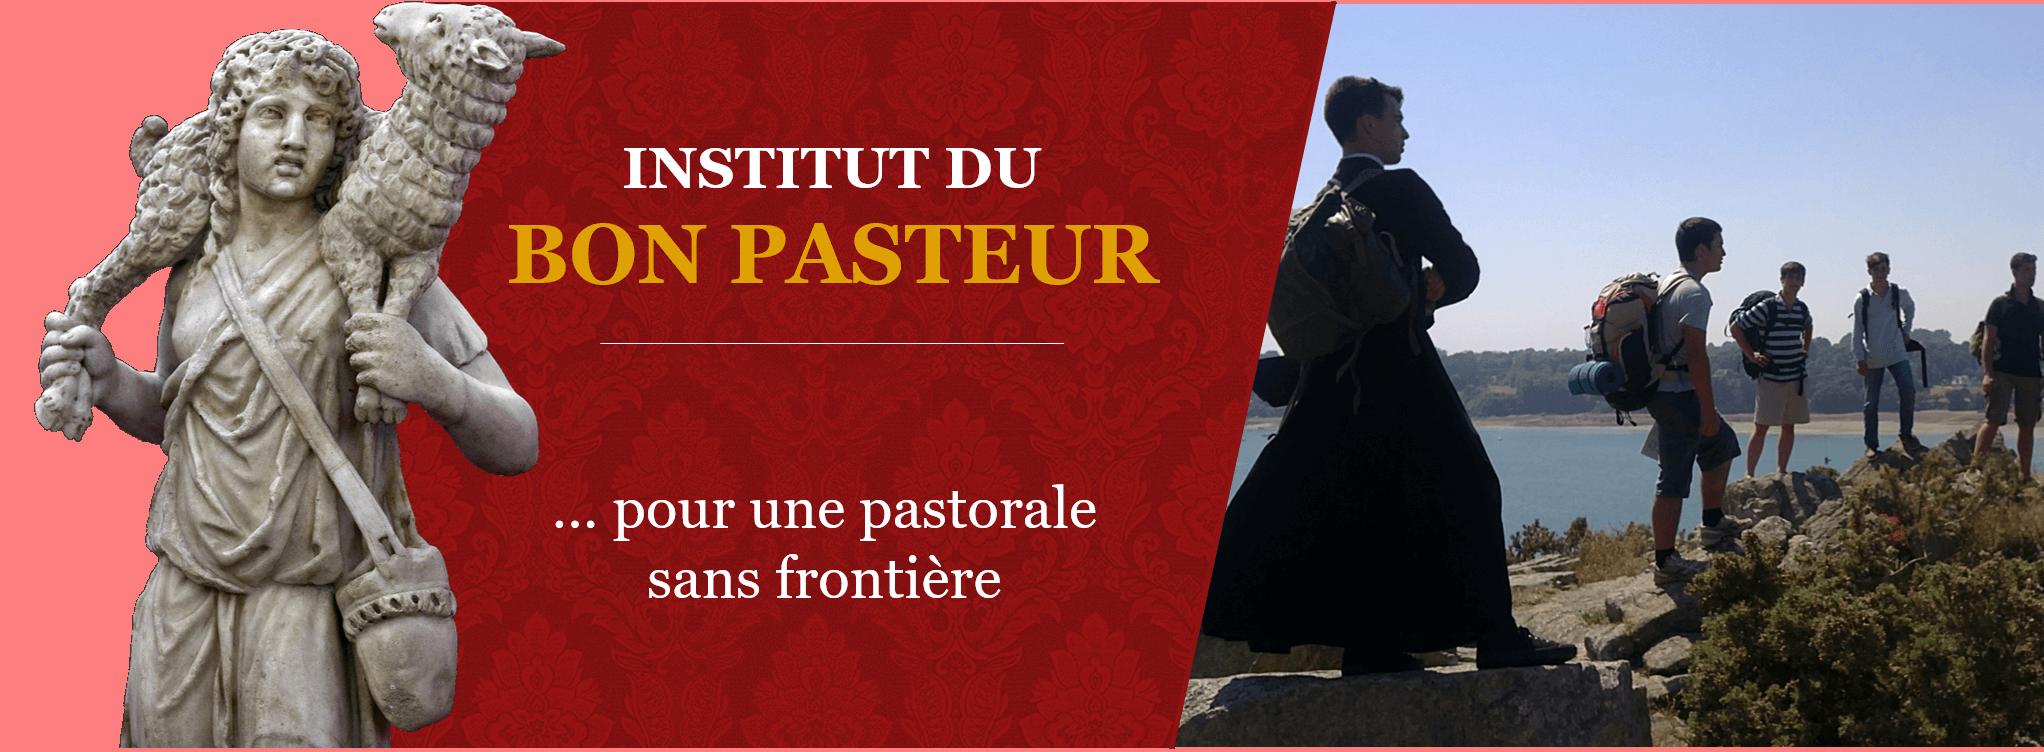 ibp-pastorale